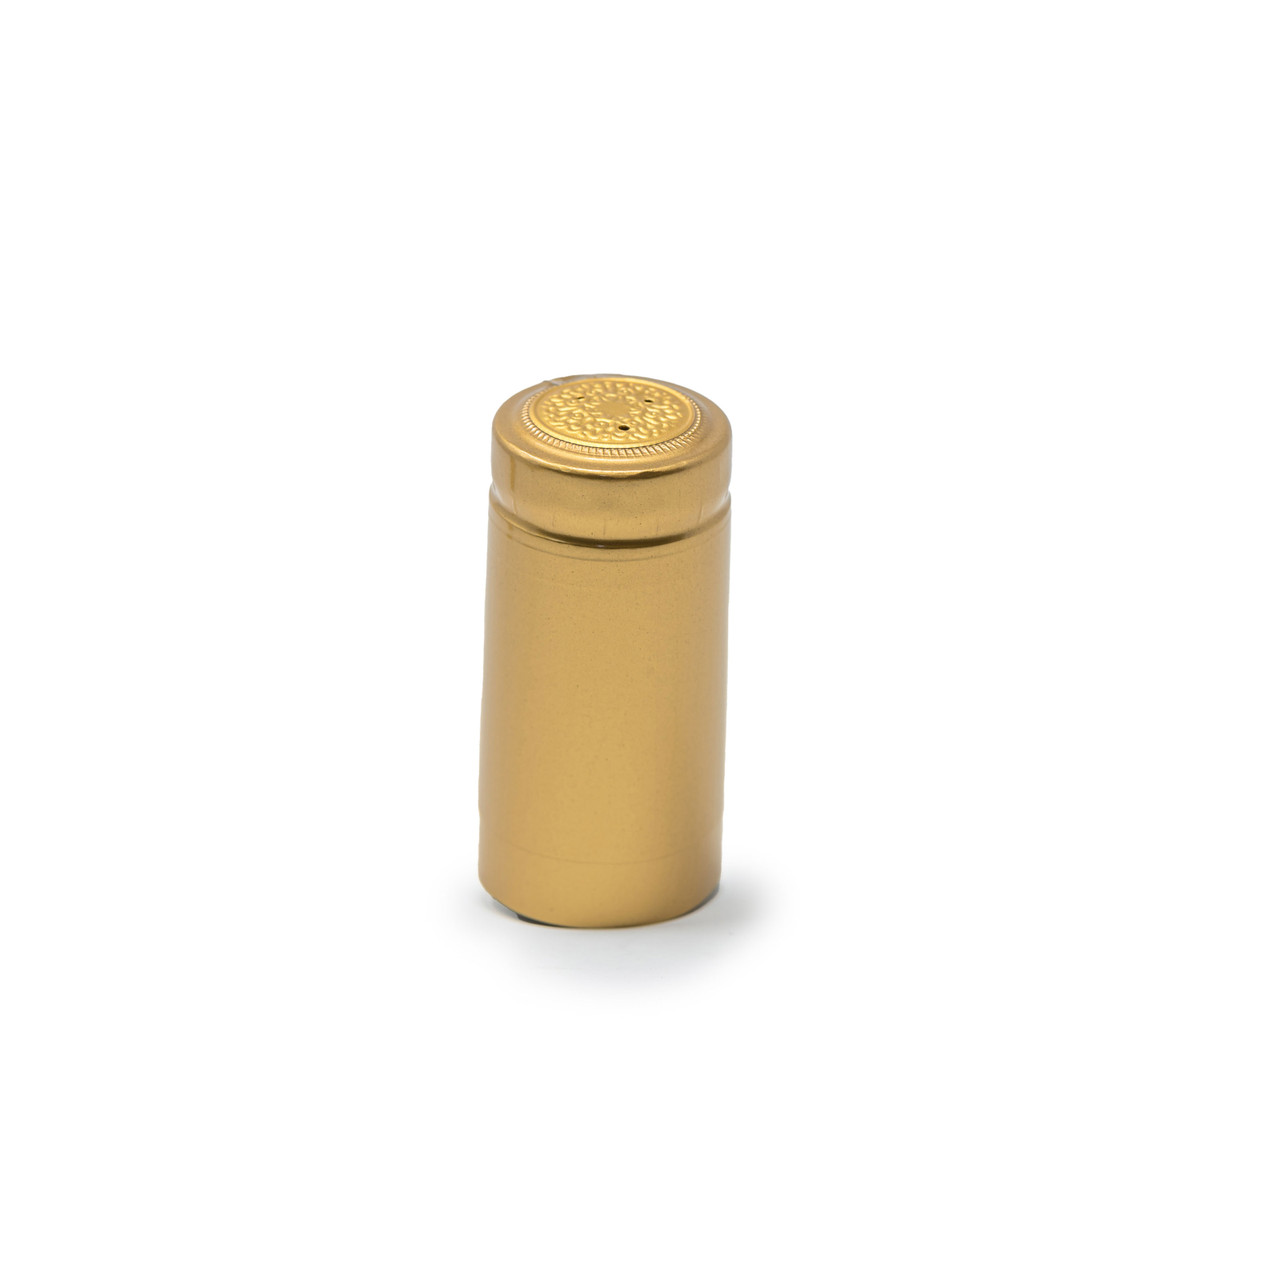 Gold shrink wrap top